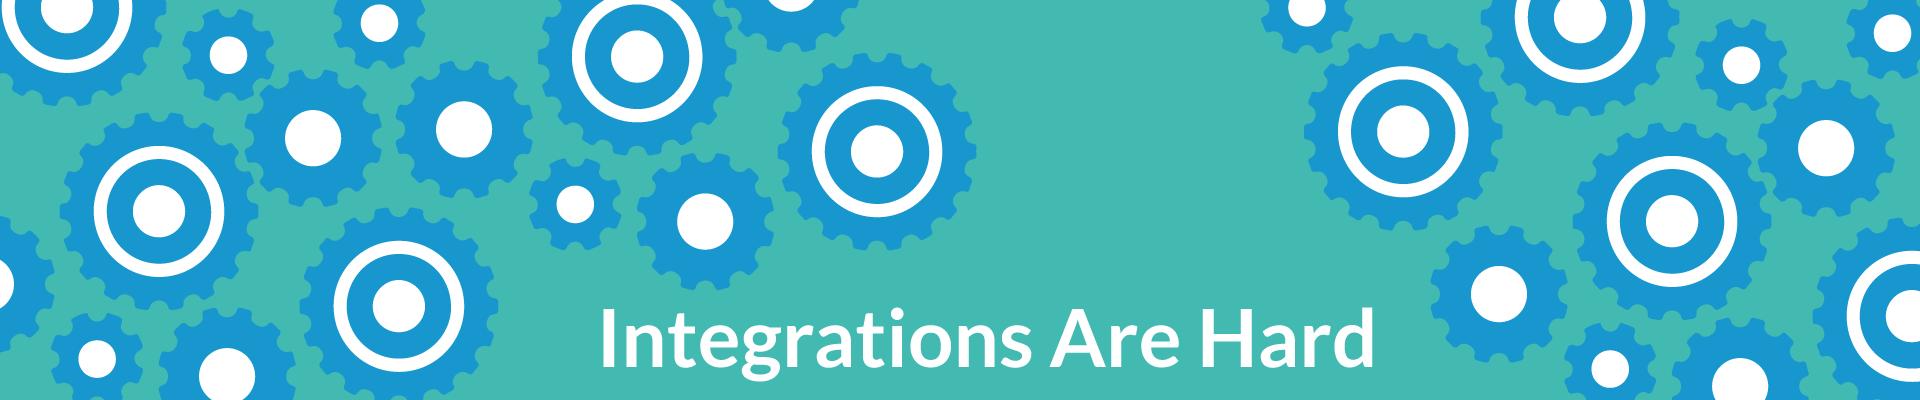 API Integrations are hard